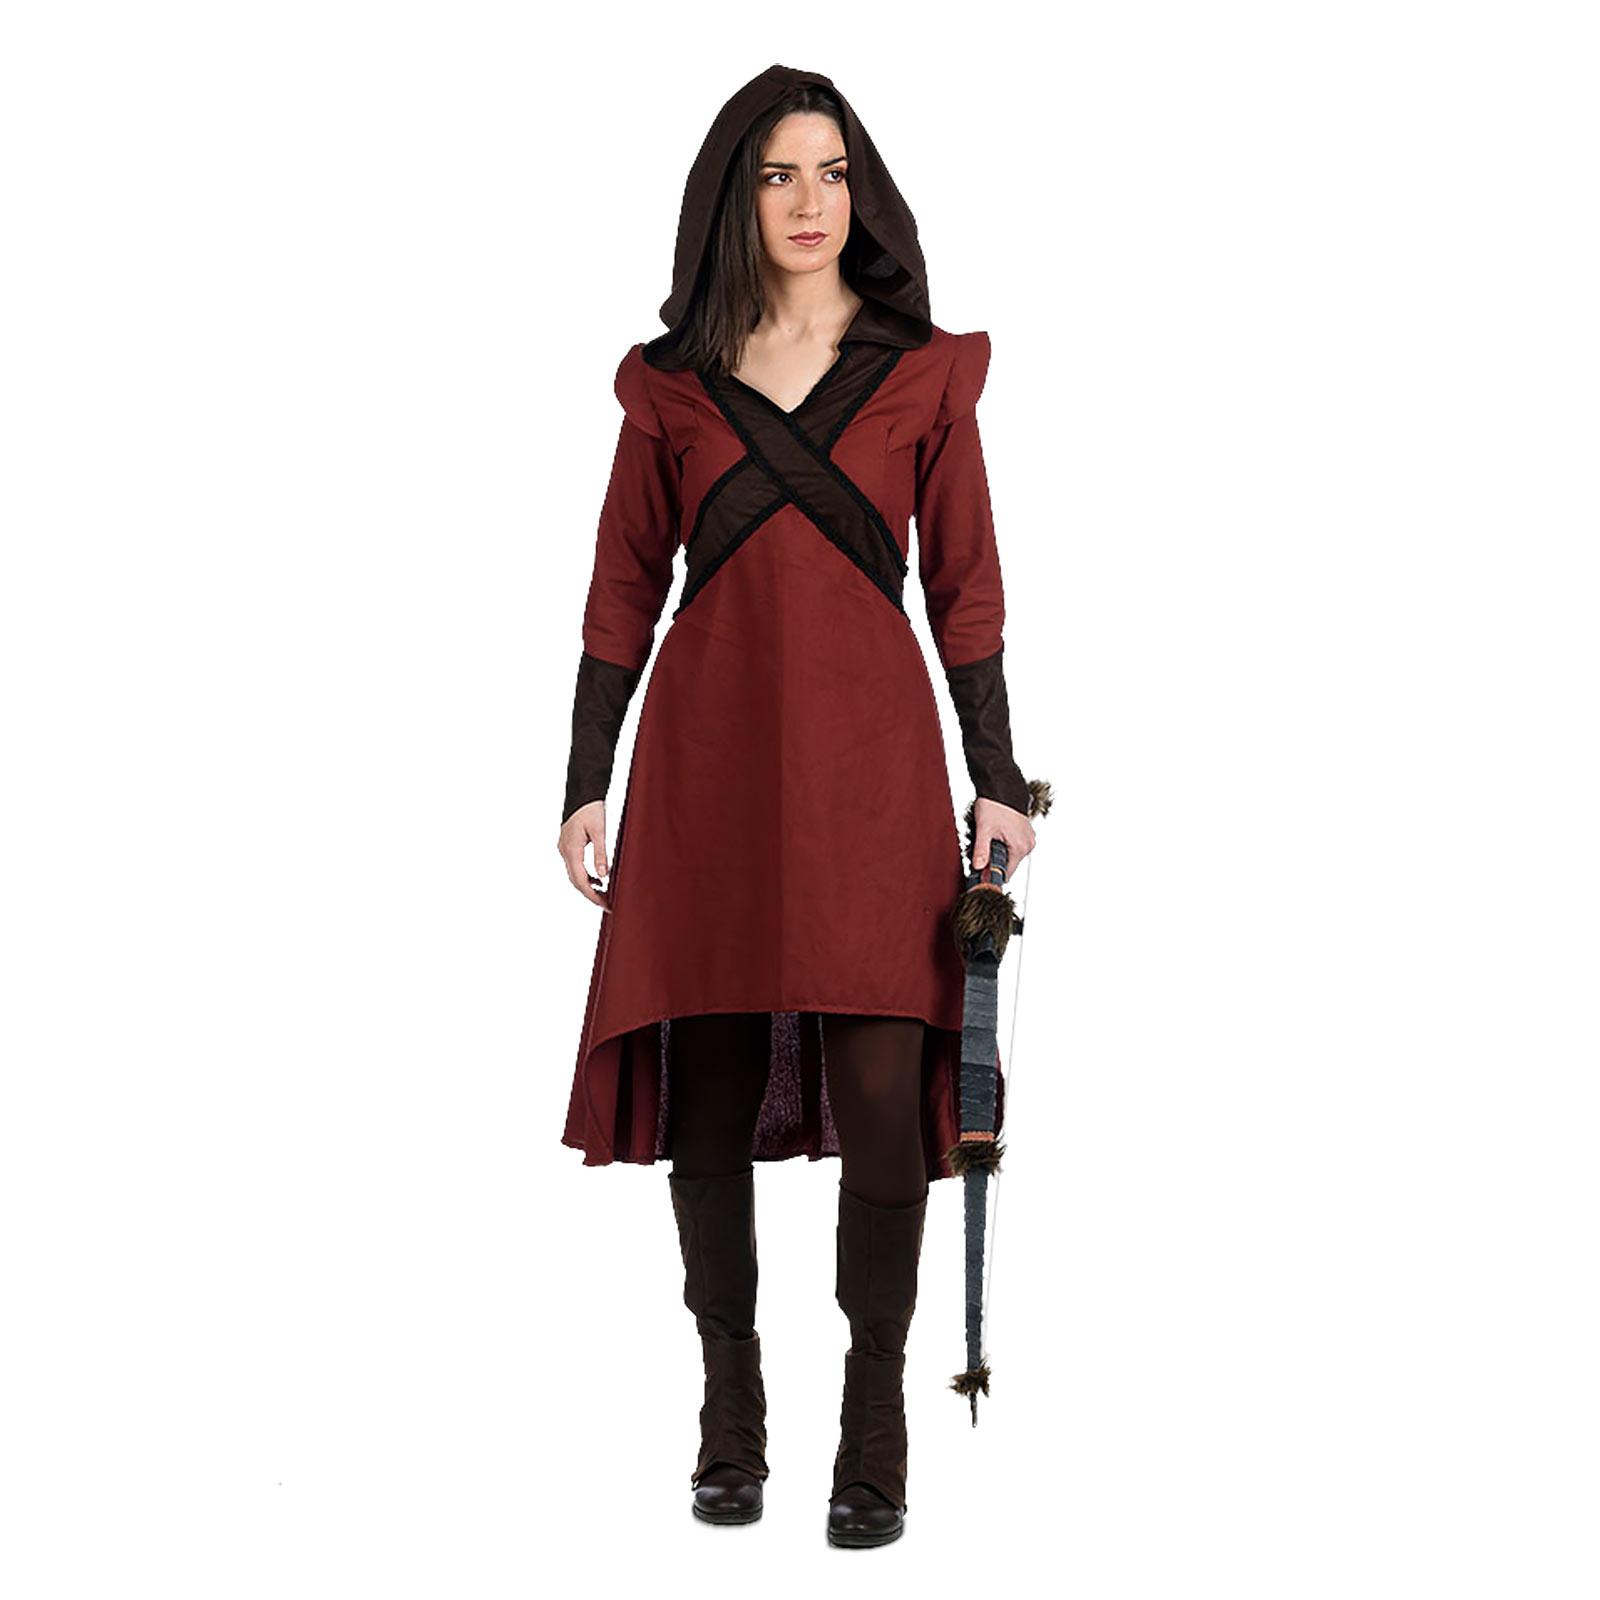 Bogenschützin Kostüm Kleid Damen rot-braun